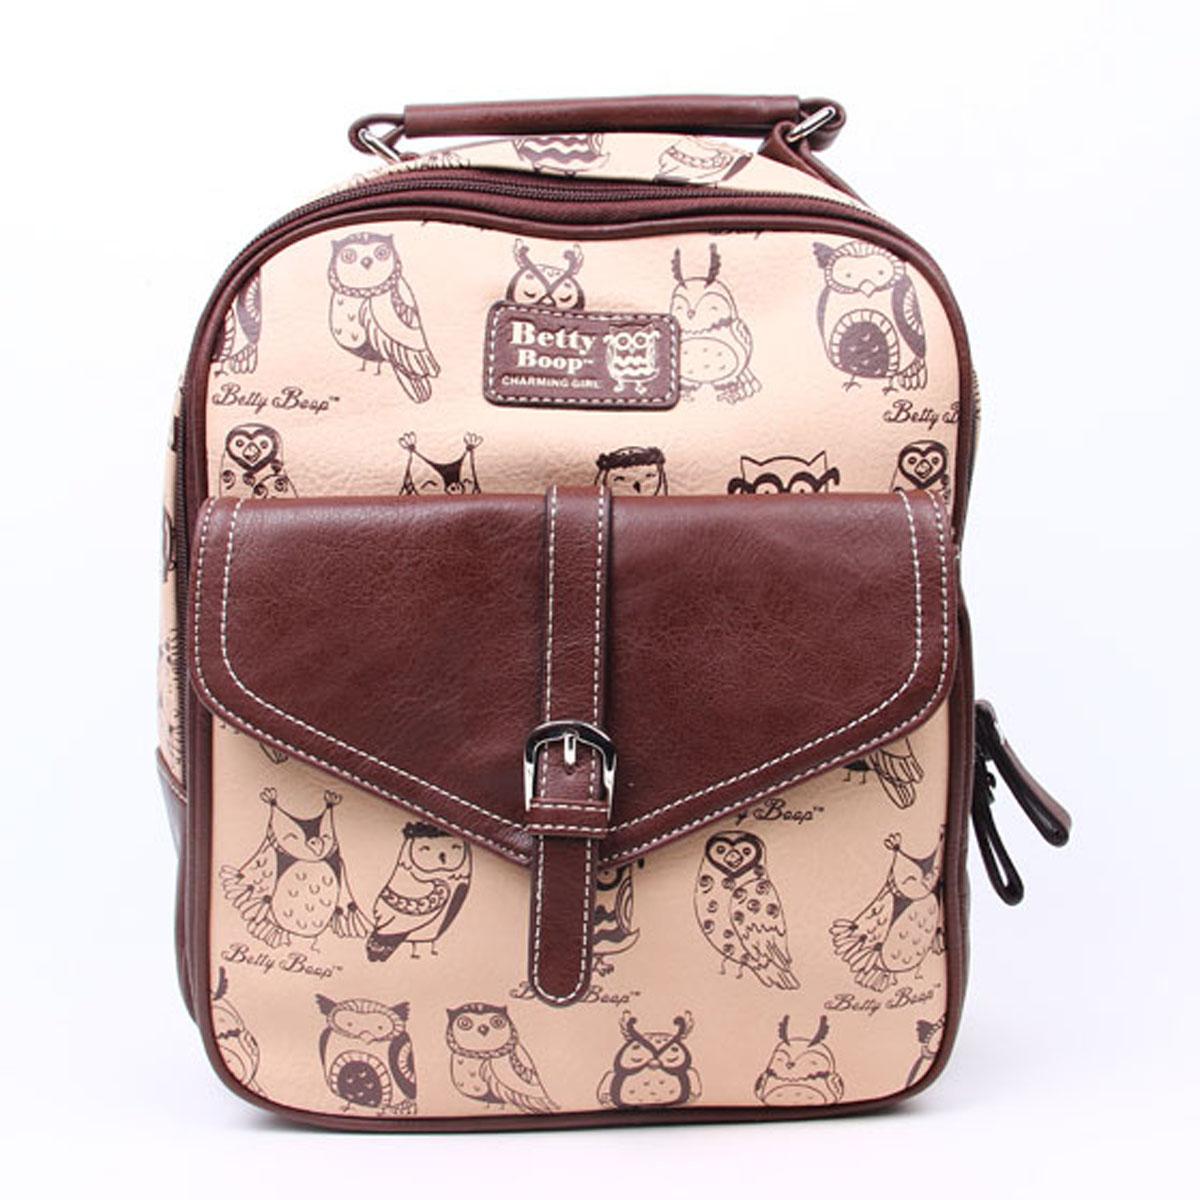 рюкзак Betty Boop a100225/51 A100225-51 通往诺贝尔奖之路